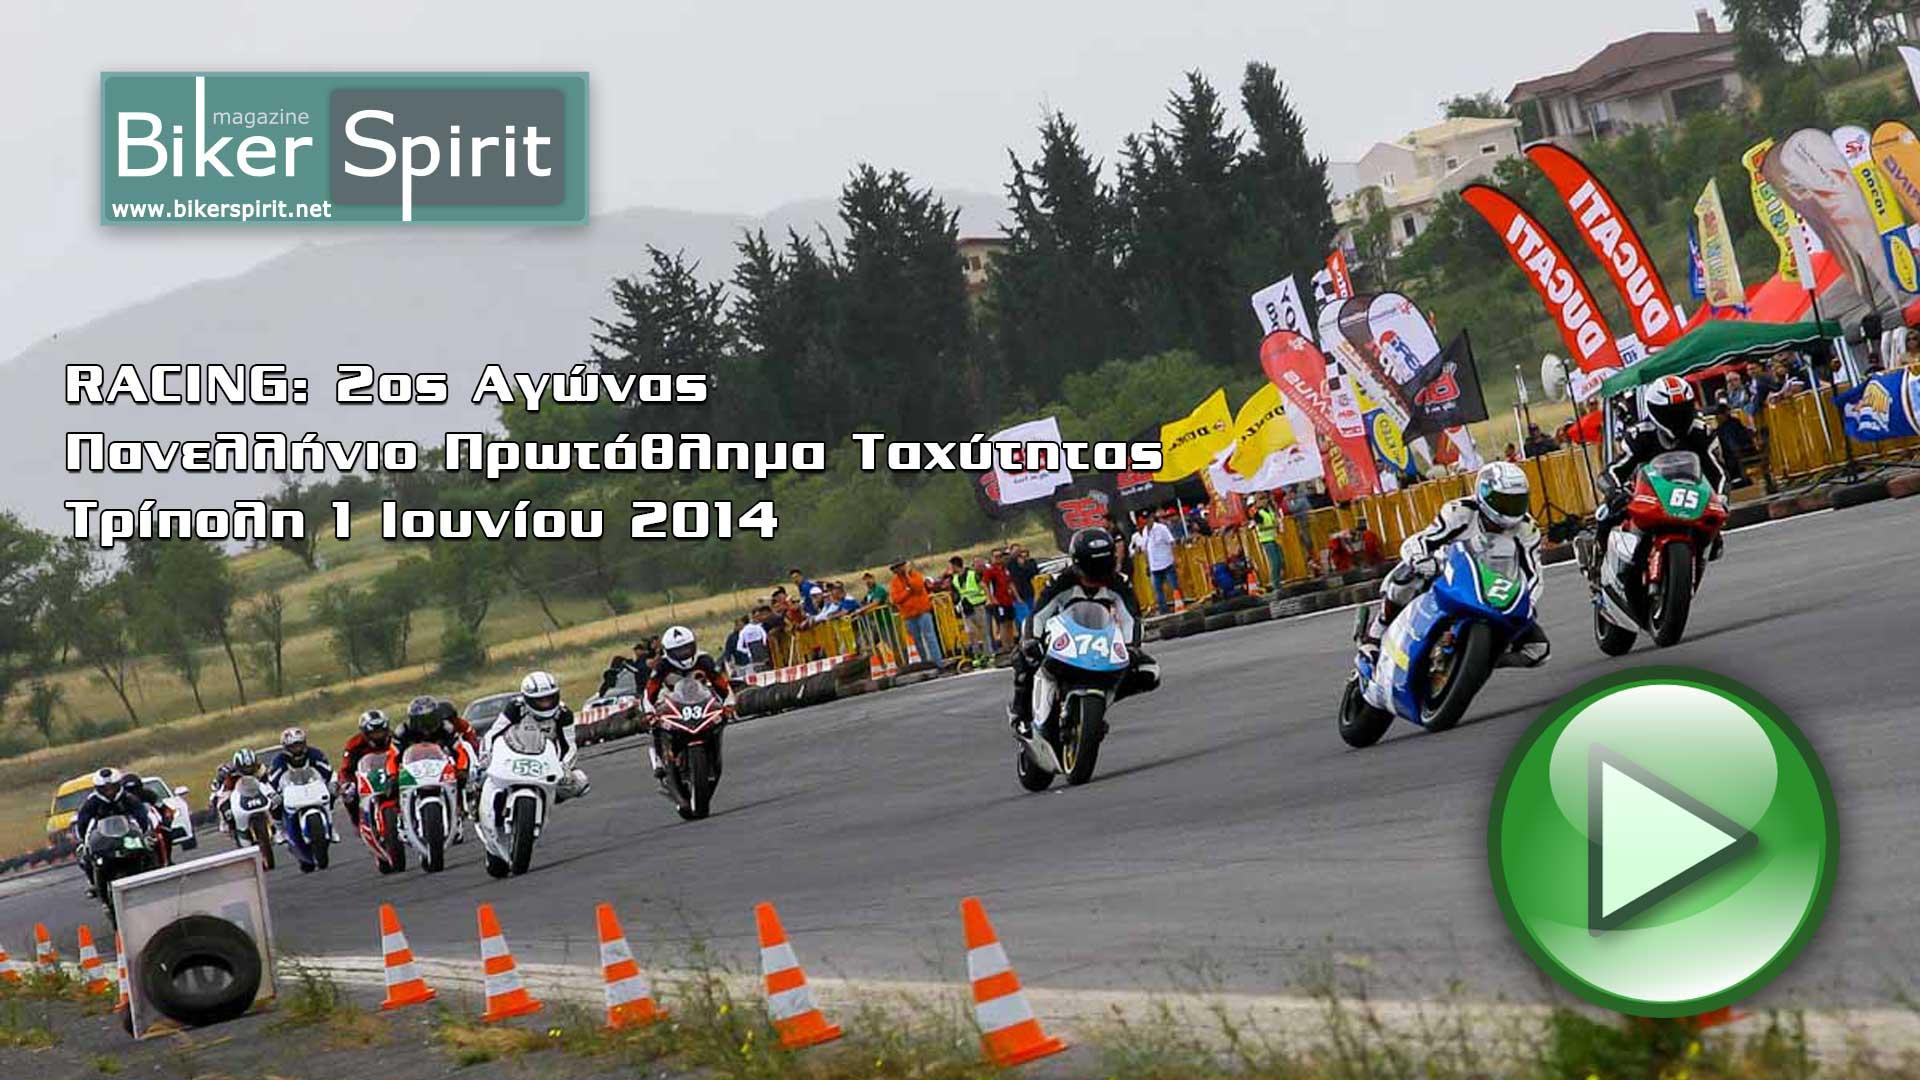 4c1152e5021 Biker Spirit magazine Περιοδικό Μοτοσυκλέτας Page 497